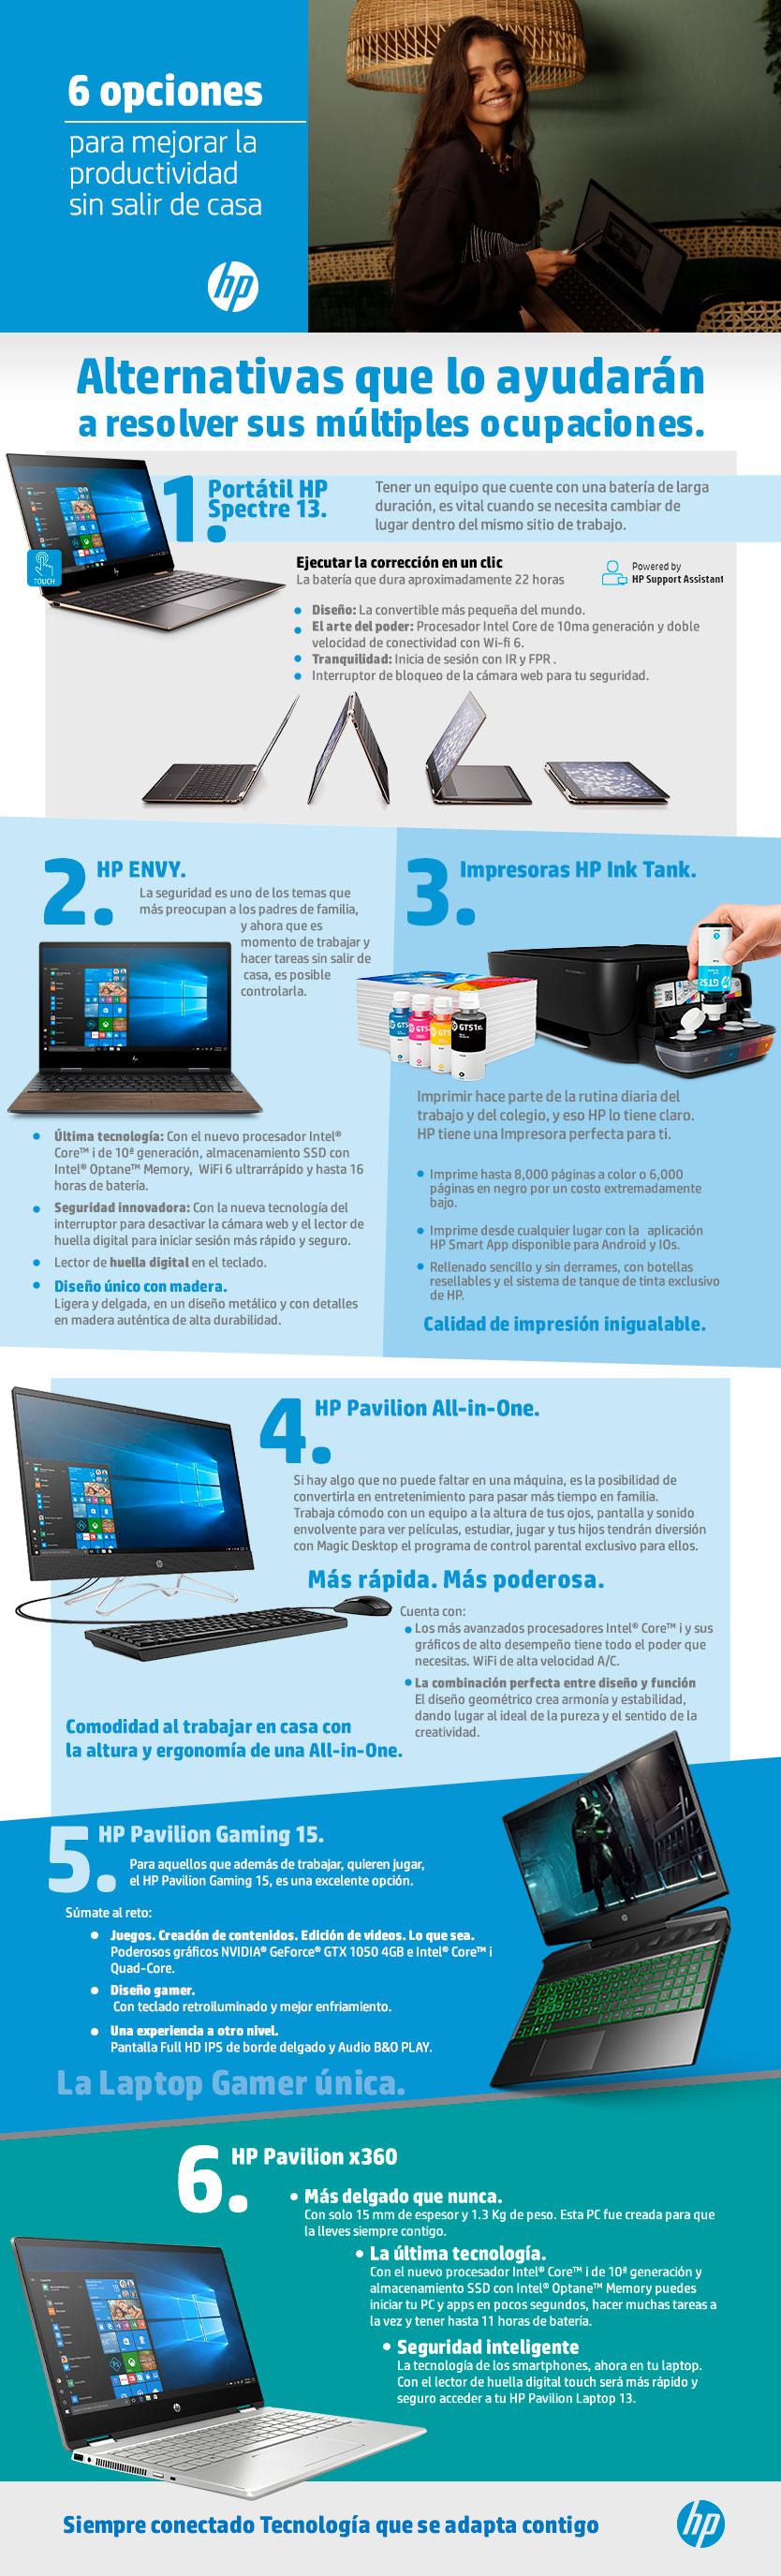 Herramientas de trabajo Hewlett-Packard